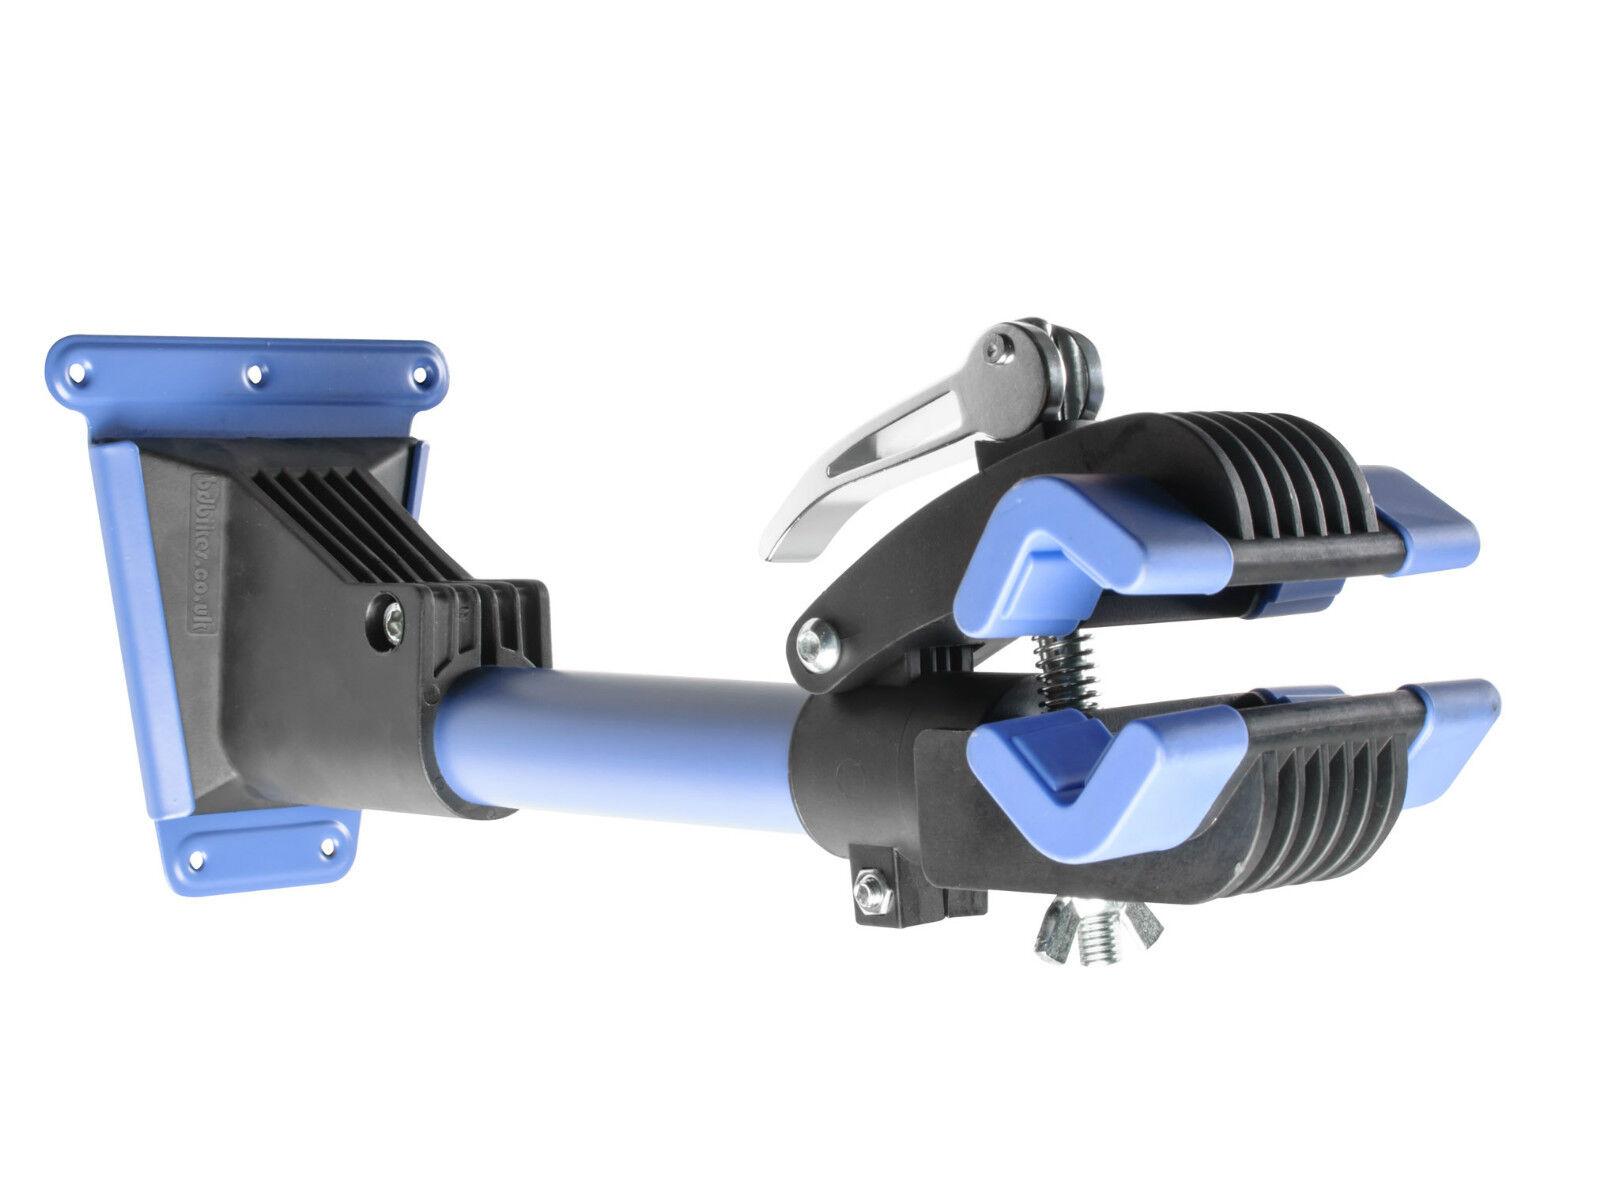 Fahrrad Reparatur Wartungsständer Fußboden für Fußboden Wartungsständer / Werkbank mit Klemmschrauben fedbff